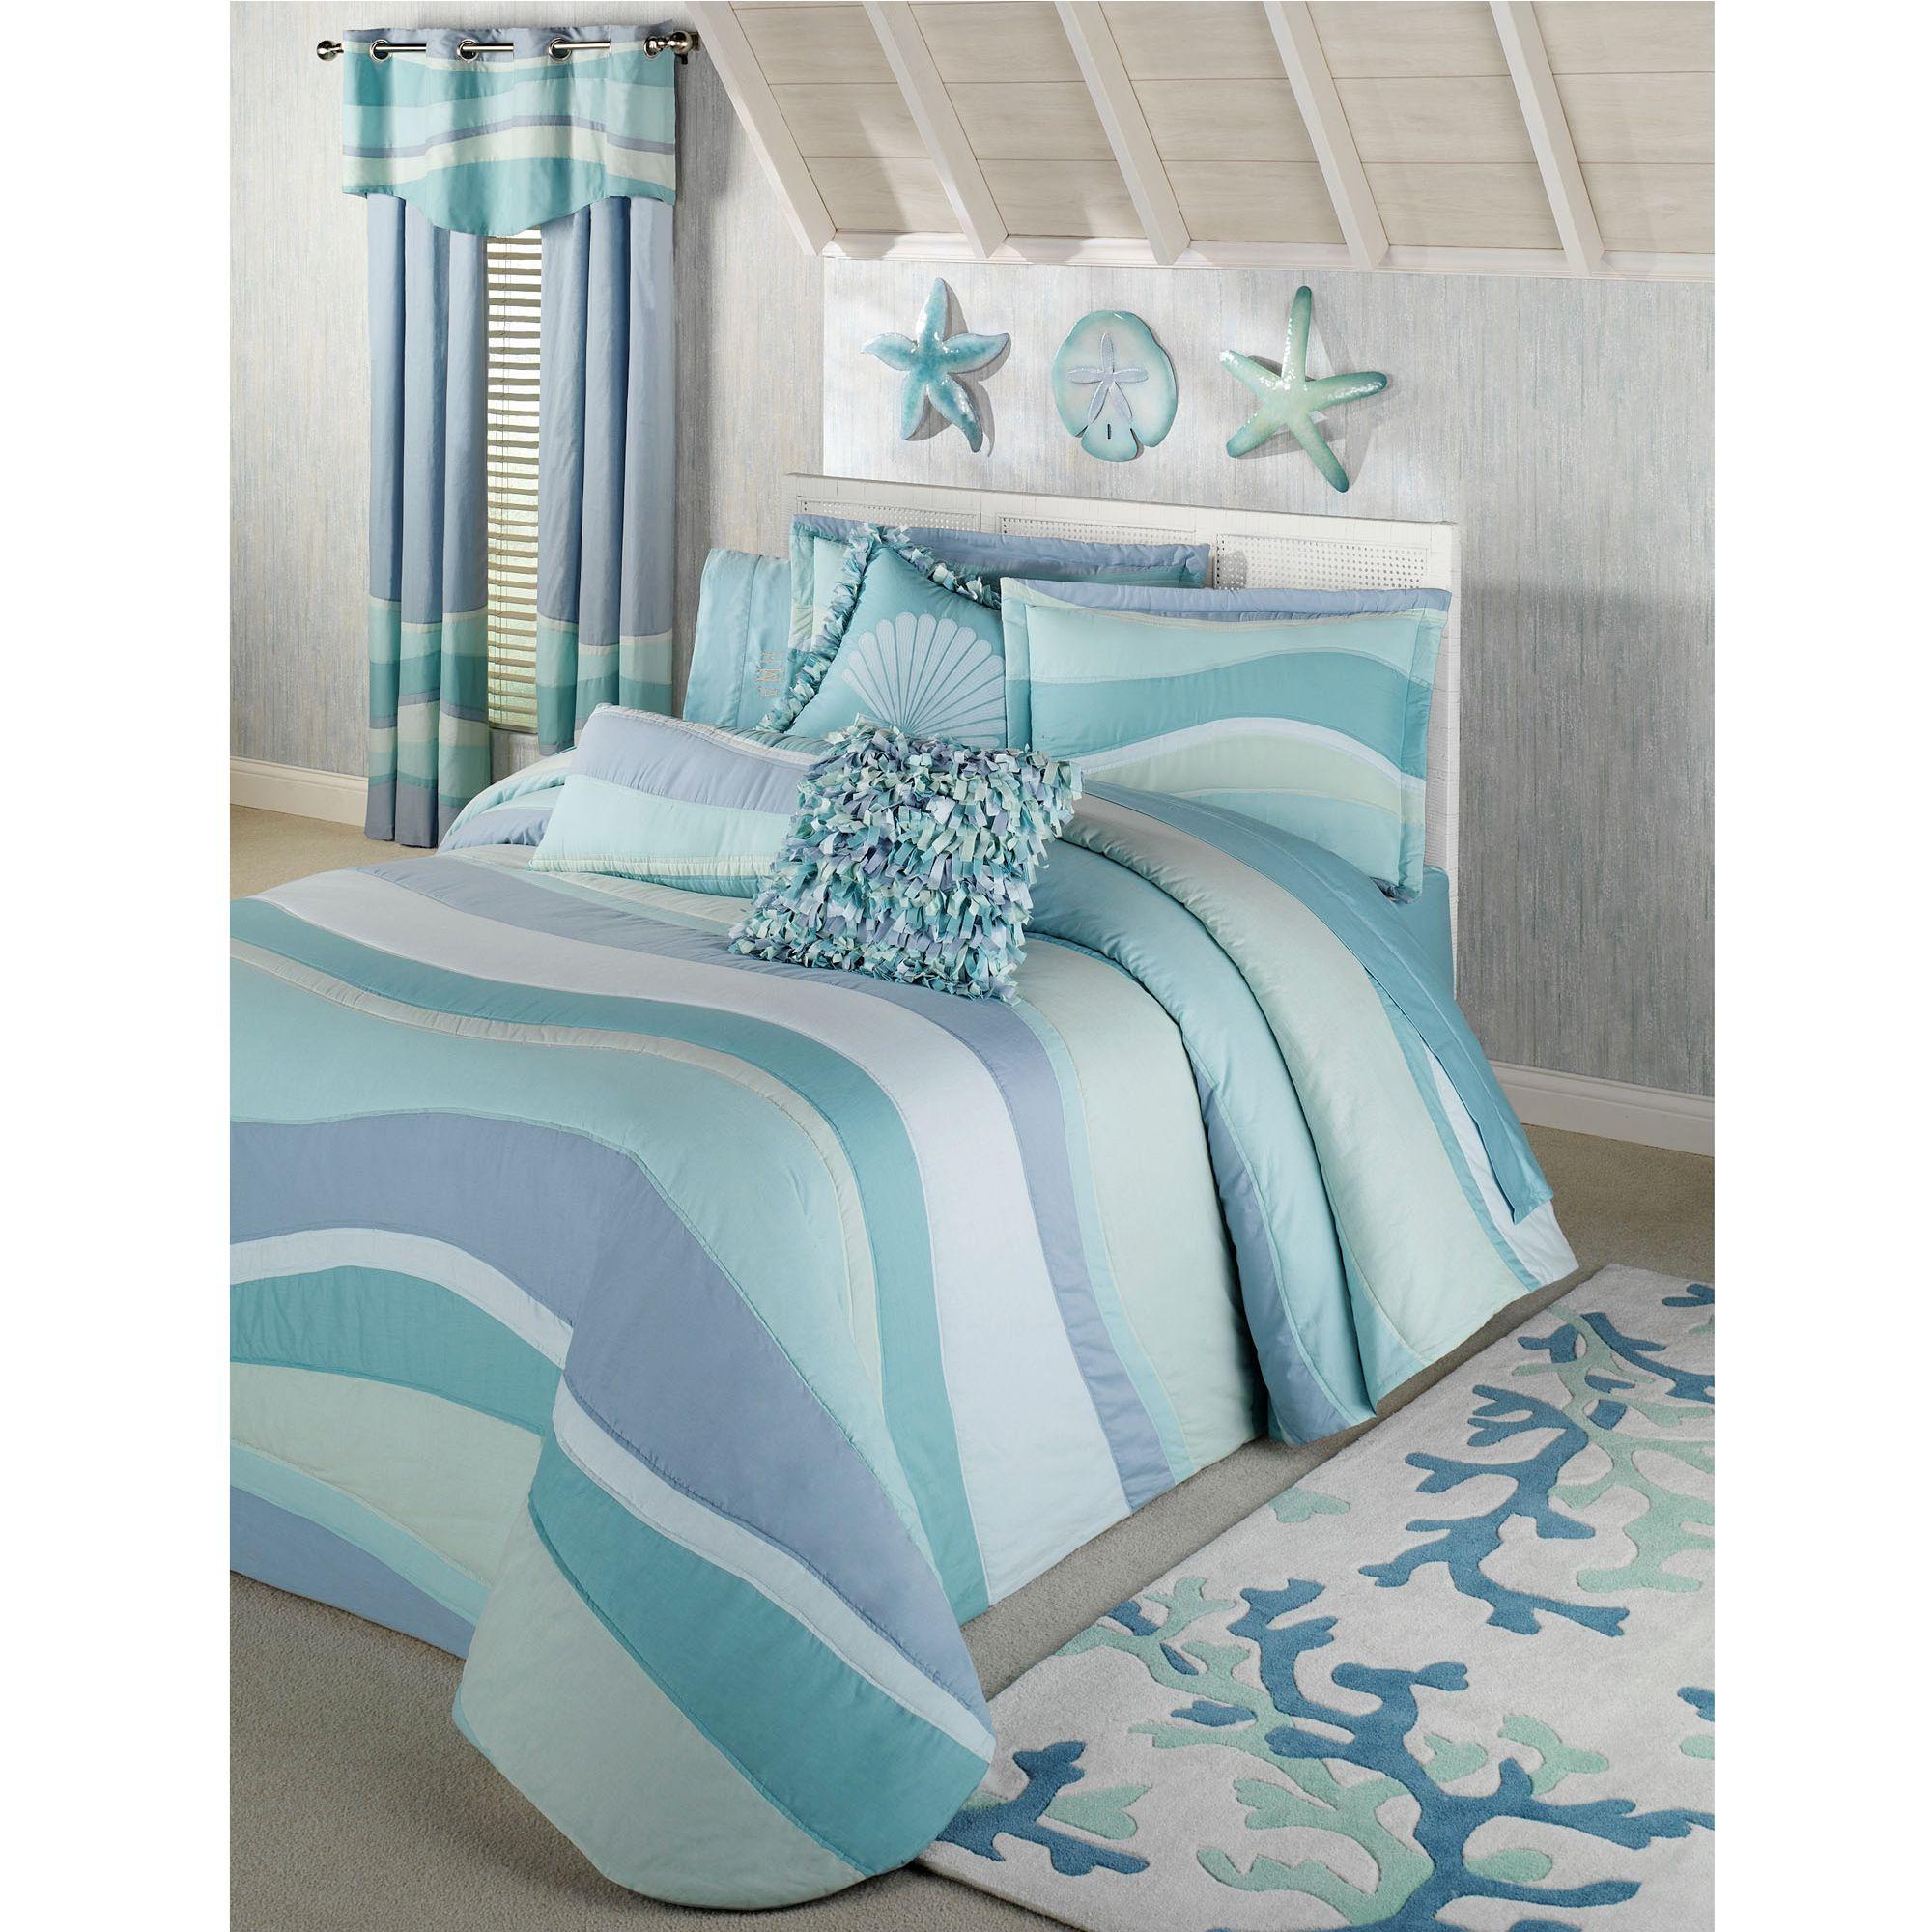 Bedroom Ideas For Boys Bedroom Vanity Ideas Bedroom Bench Name Elsa Bedroom Ideas: Coastal Daybed Bedding Sets